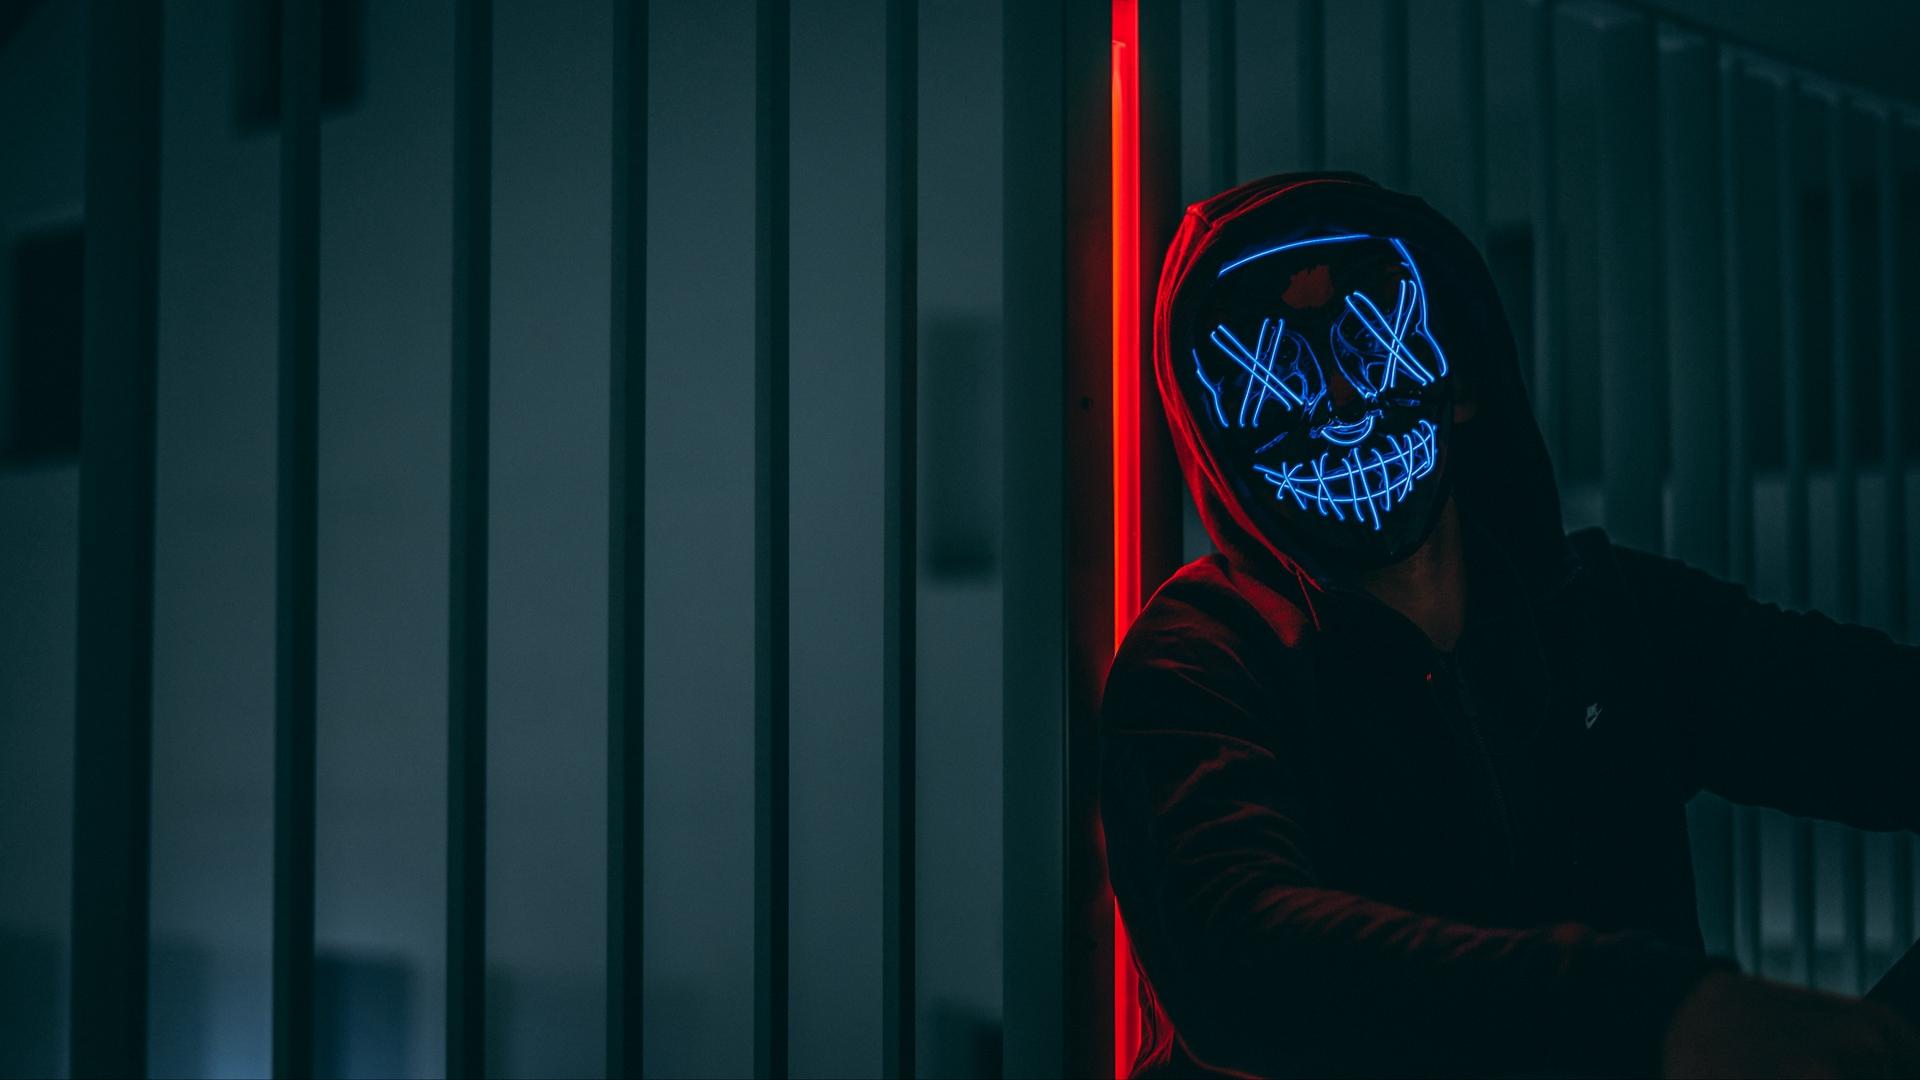 Download wallpaper 1920x1080 mask hood neon anonymous glow 1920x1080